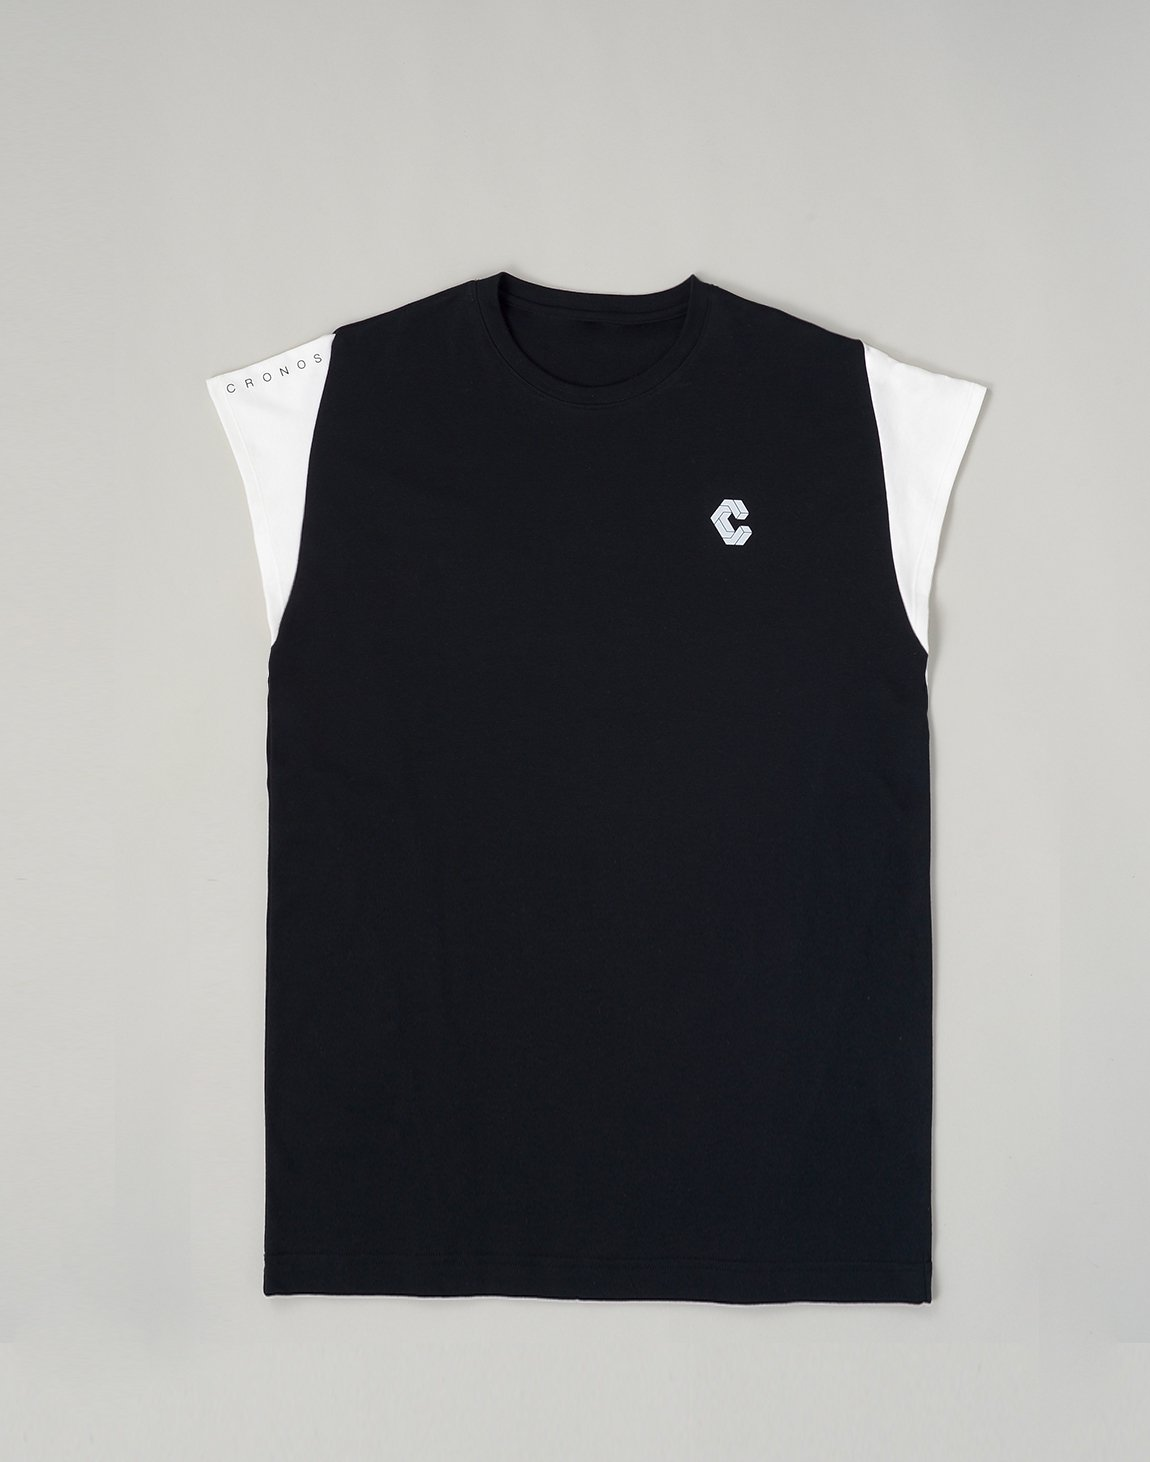 CRONOS LATS LINE CAP SLEEVE TOP【BLACK】